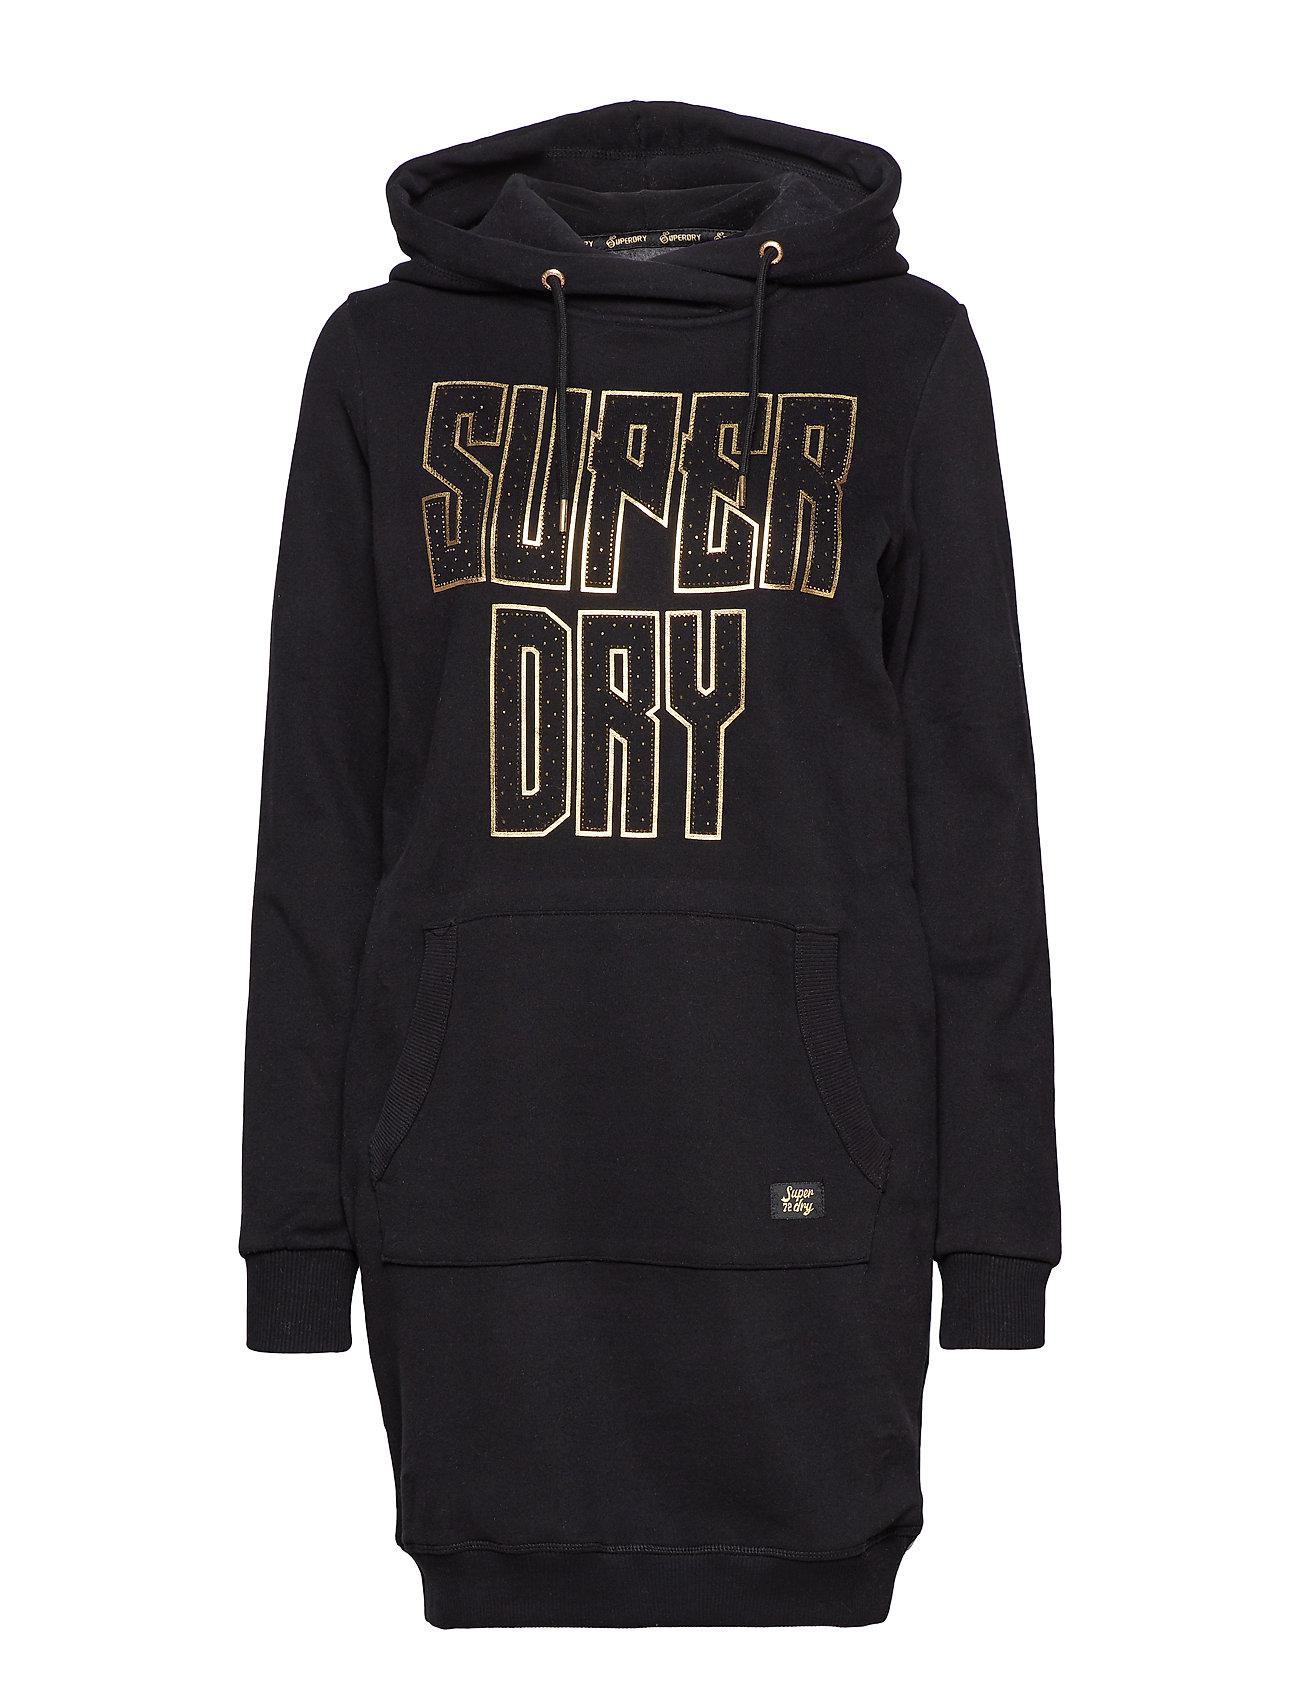 Superdry DEAKIN EMBELLISHED SWEAT DRESS - BLACK